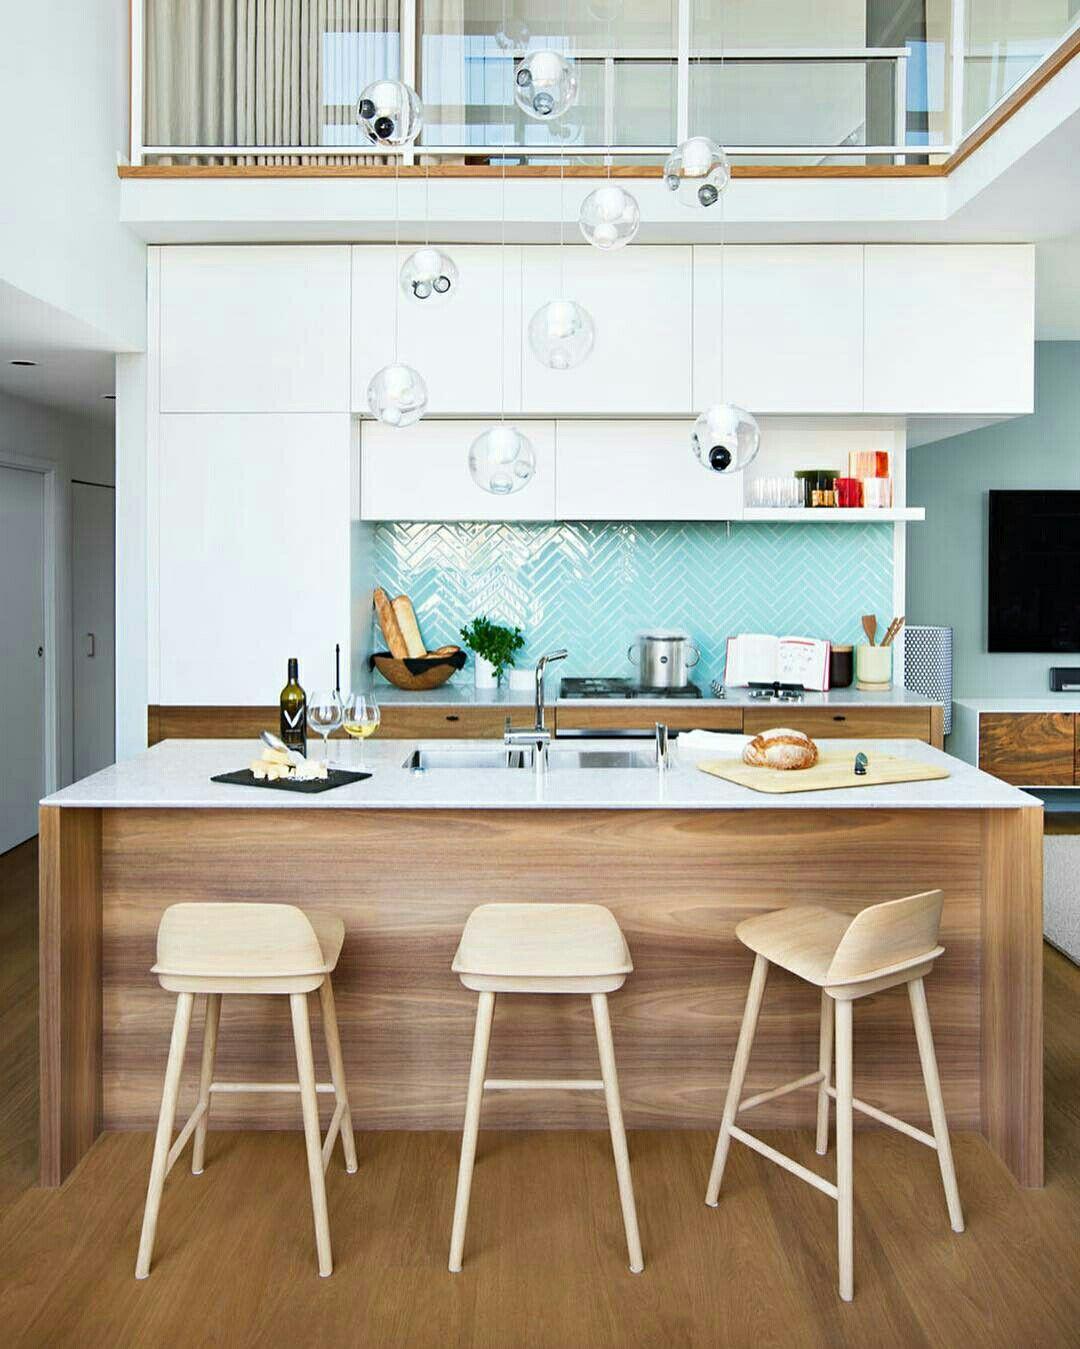 Cool tones also diseno de interiores interior design pinterest rh ar